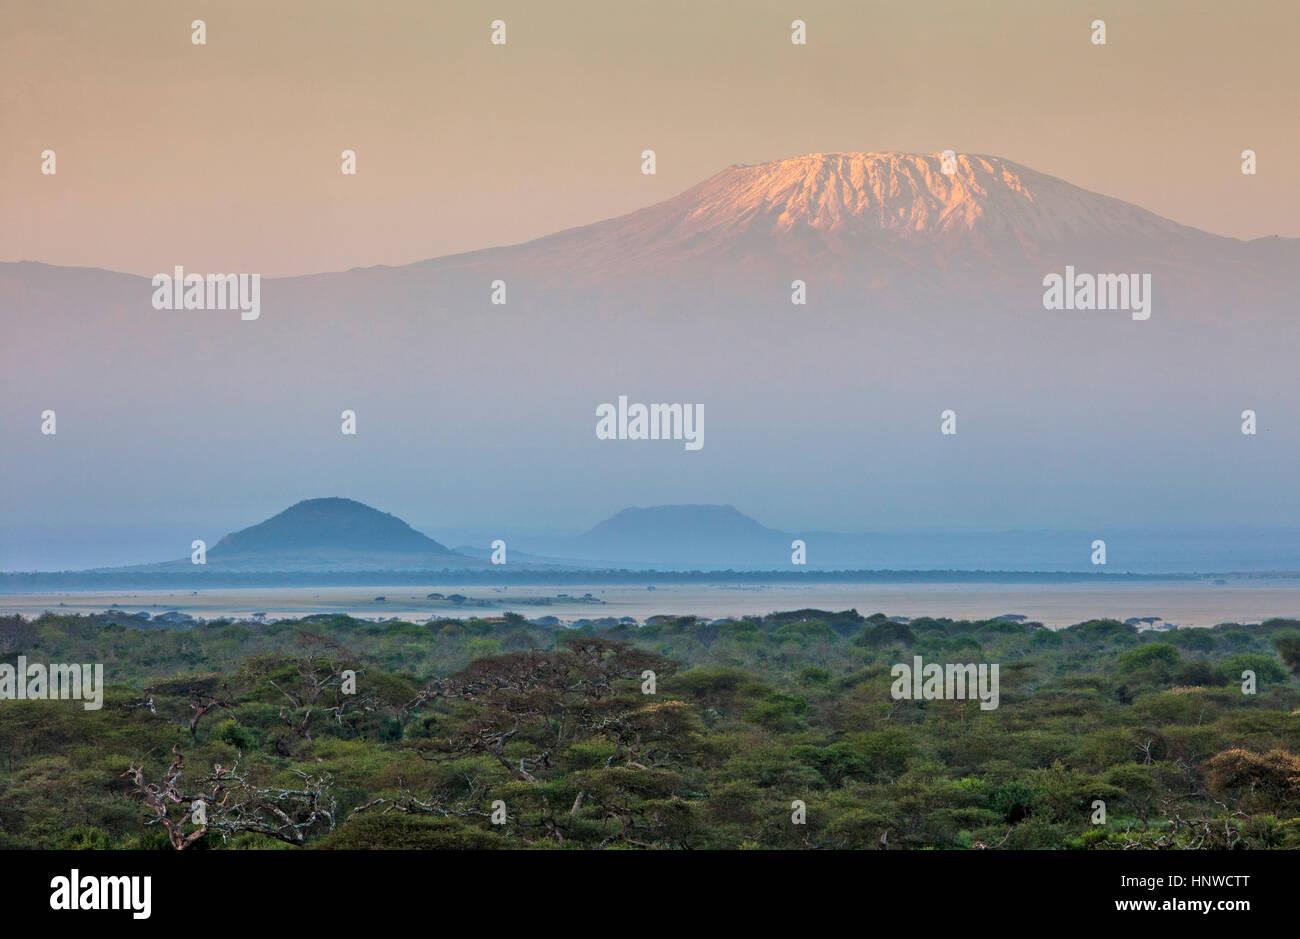 Mount Kilimanjaro, from Chyulu Hills National Park, Kenya - Stock Image